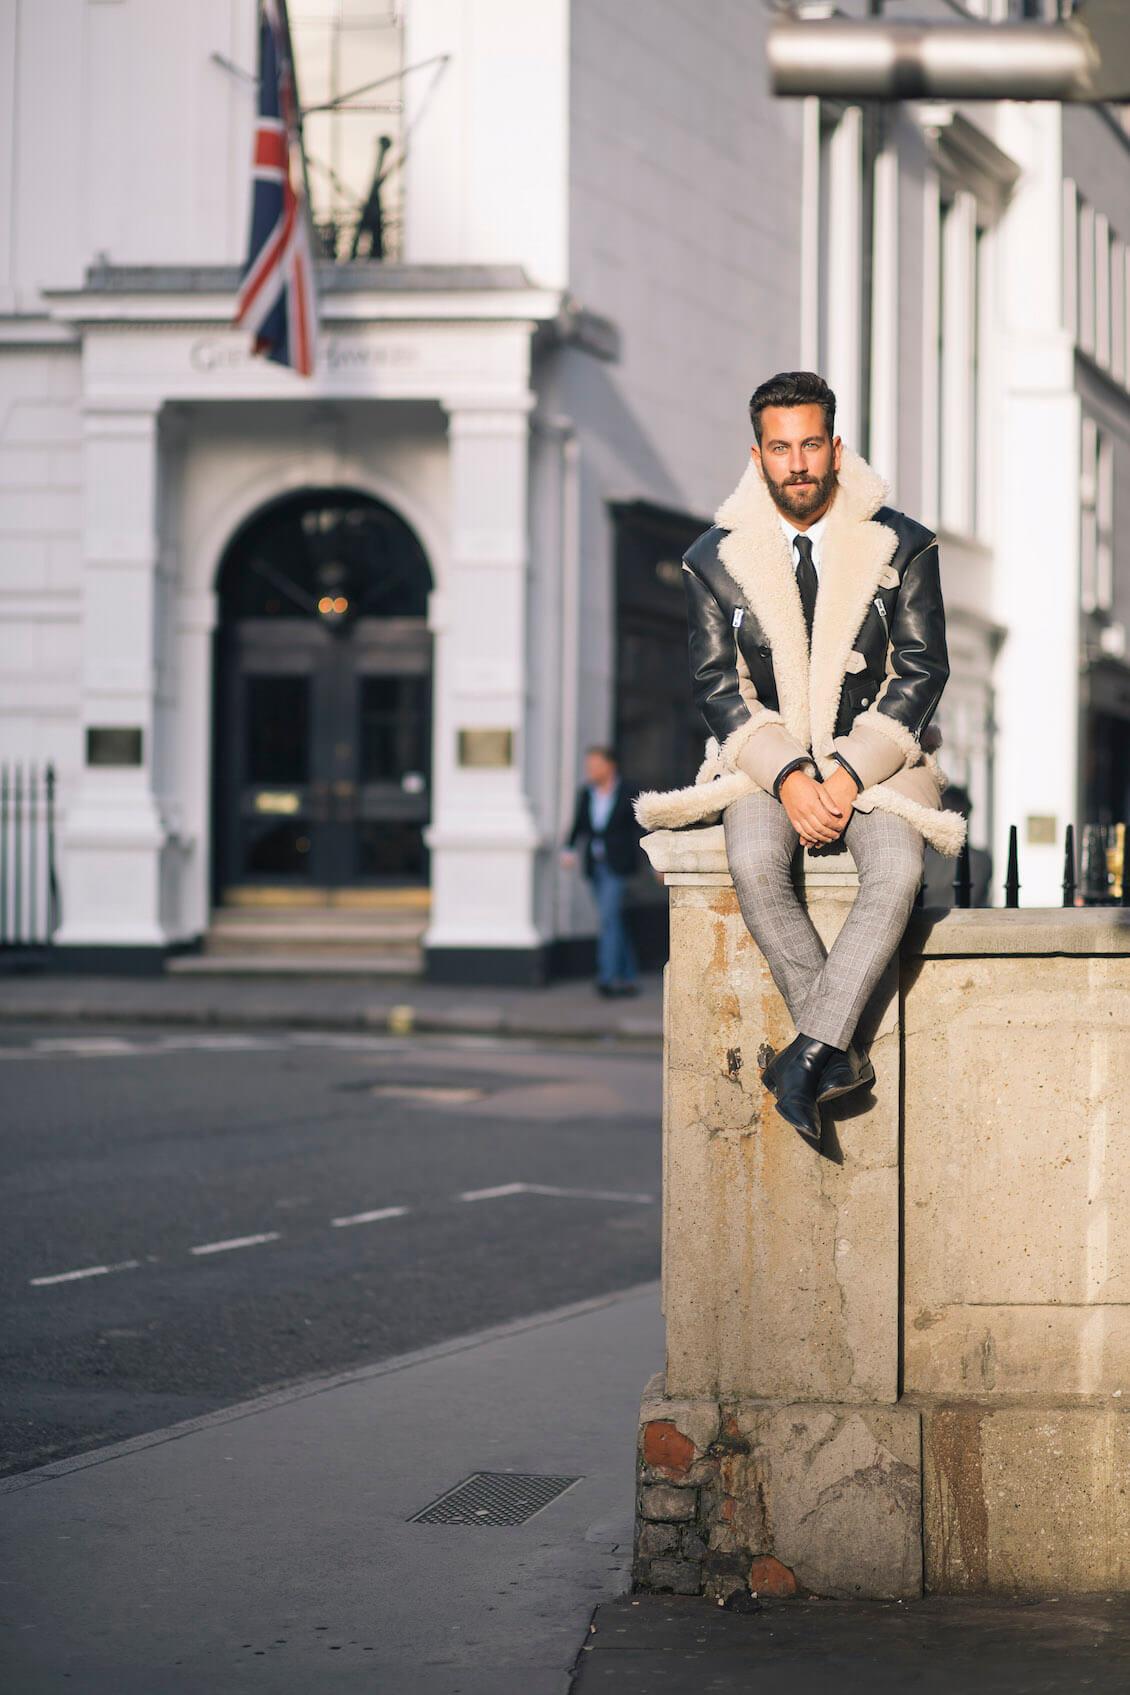 Matthew Zorpas, The Gentleman Blogger